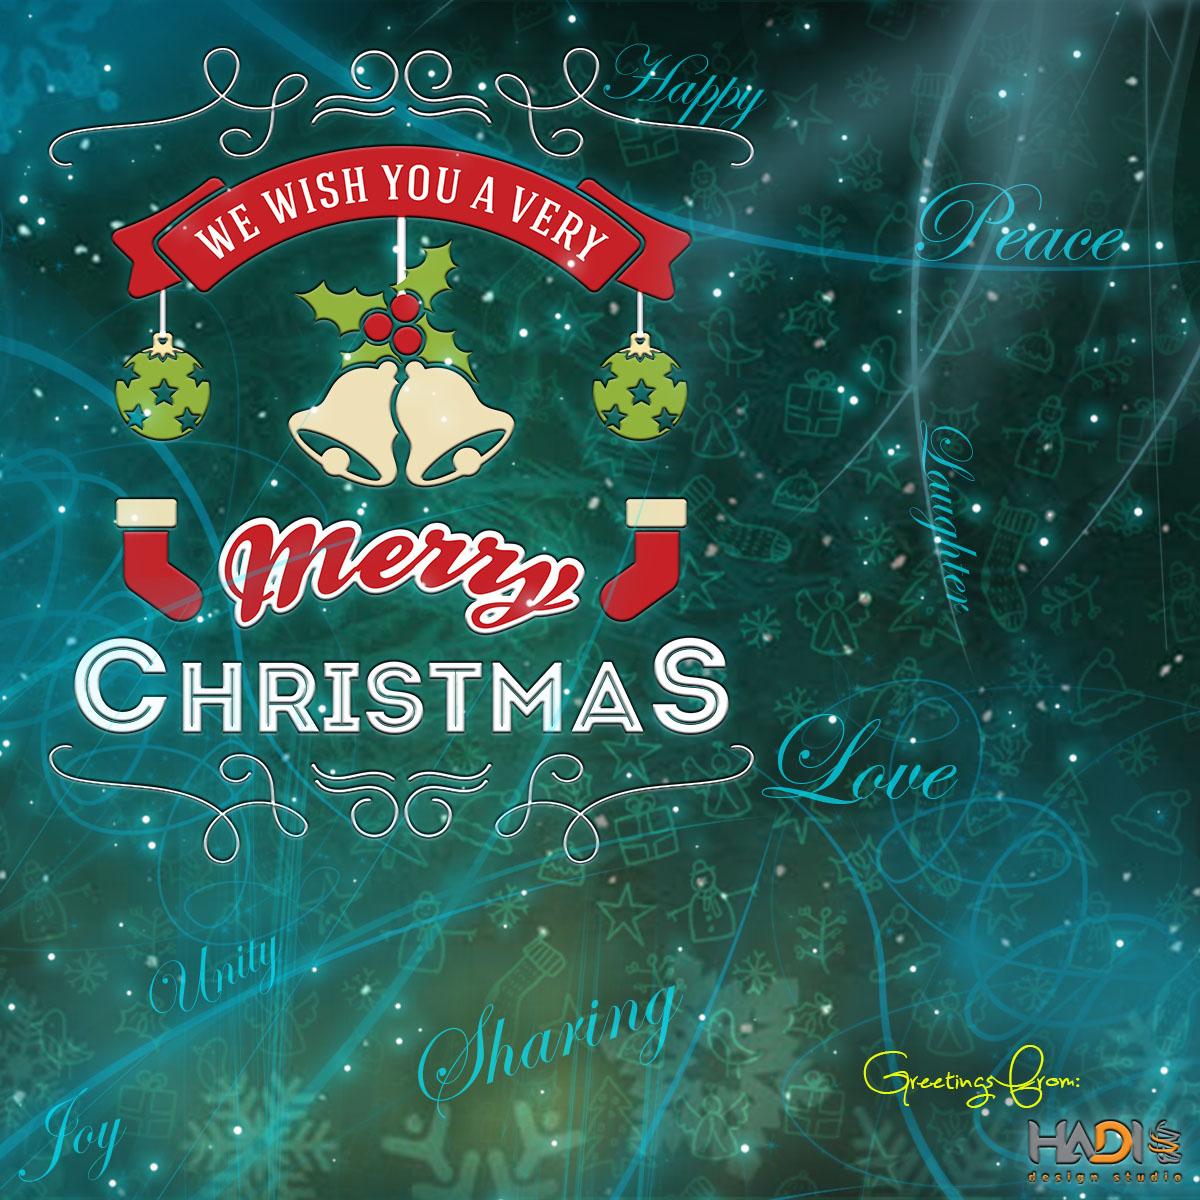 Hadi Design Studio Merry Christmas Greetings From Acme